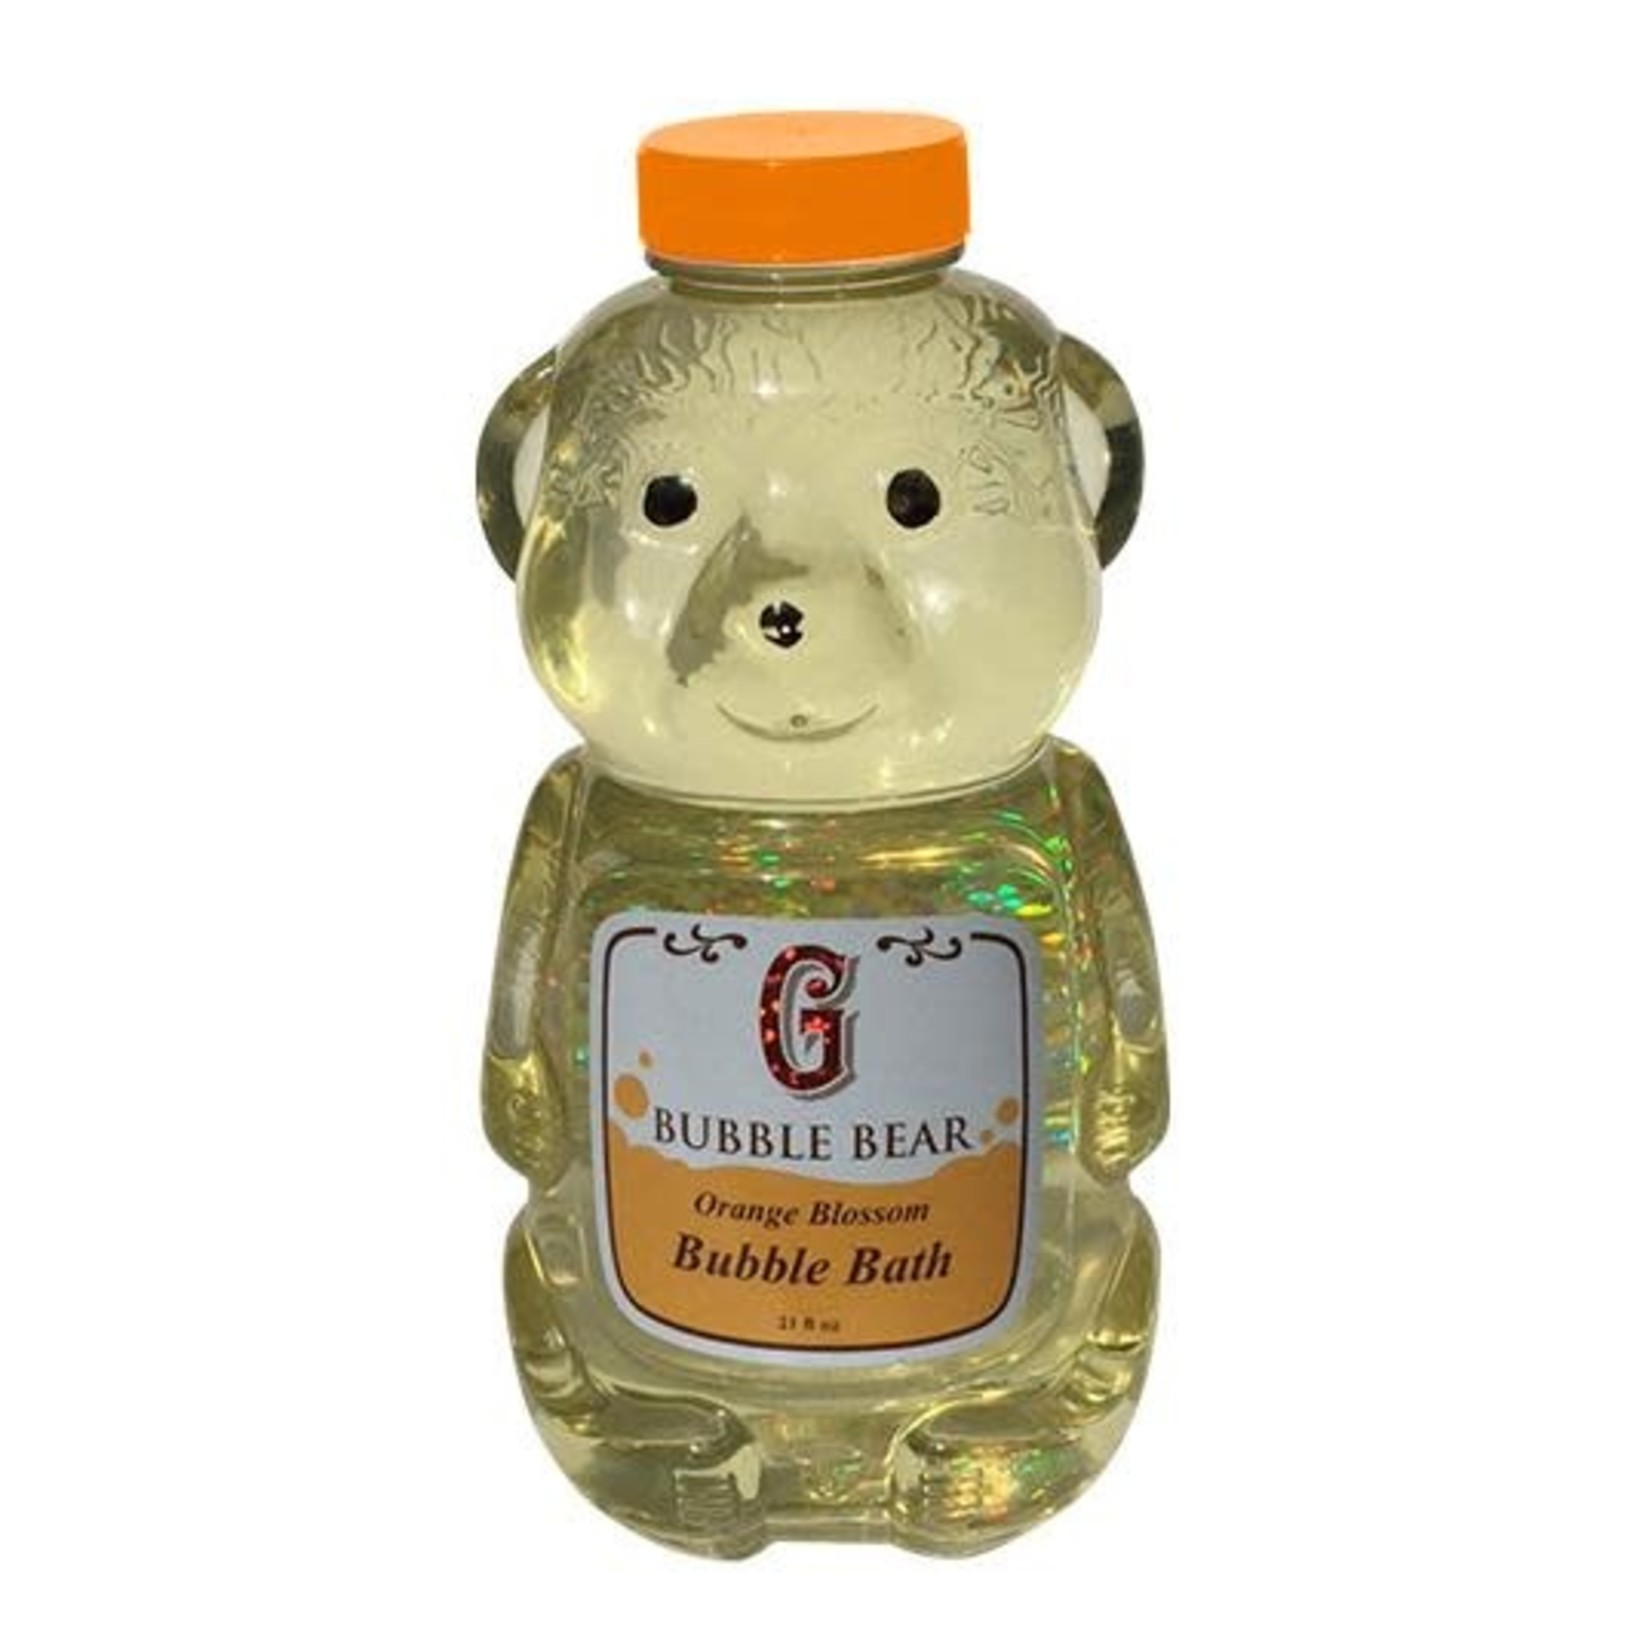 GRIFFIN REMEDY Griffin Remedy Bubble Bear Bubble Bath Orange Blossom